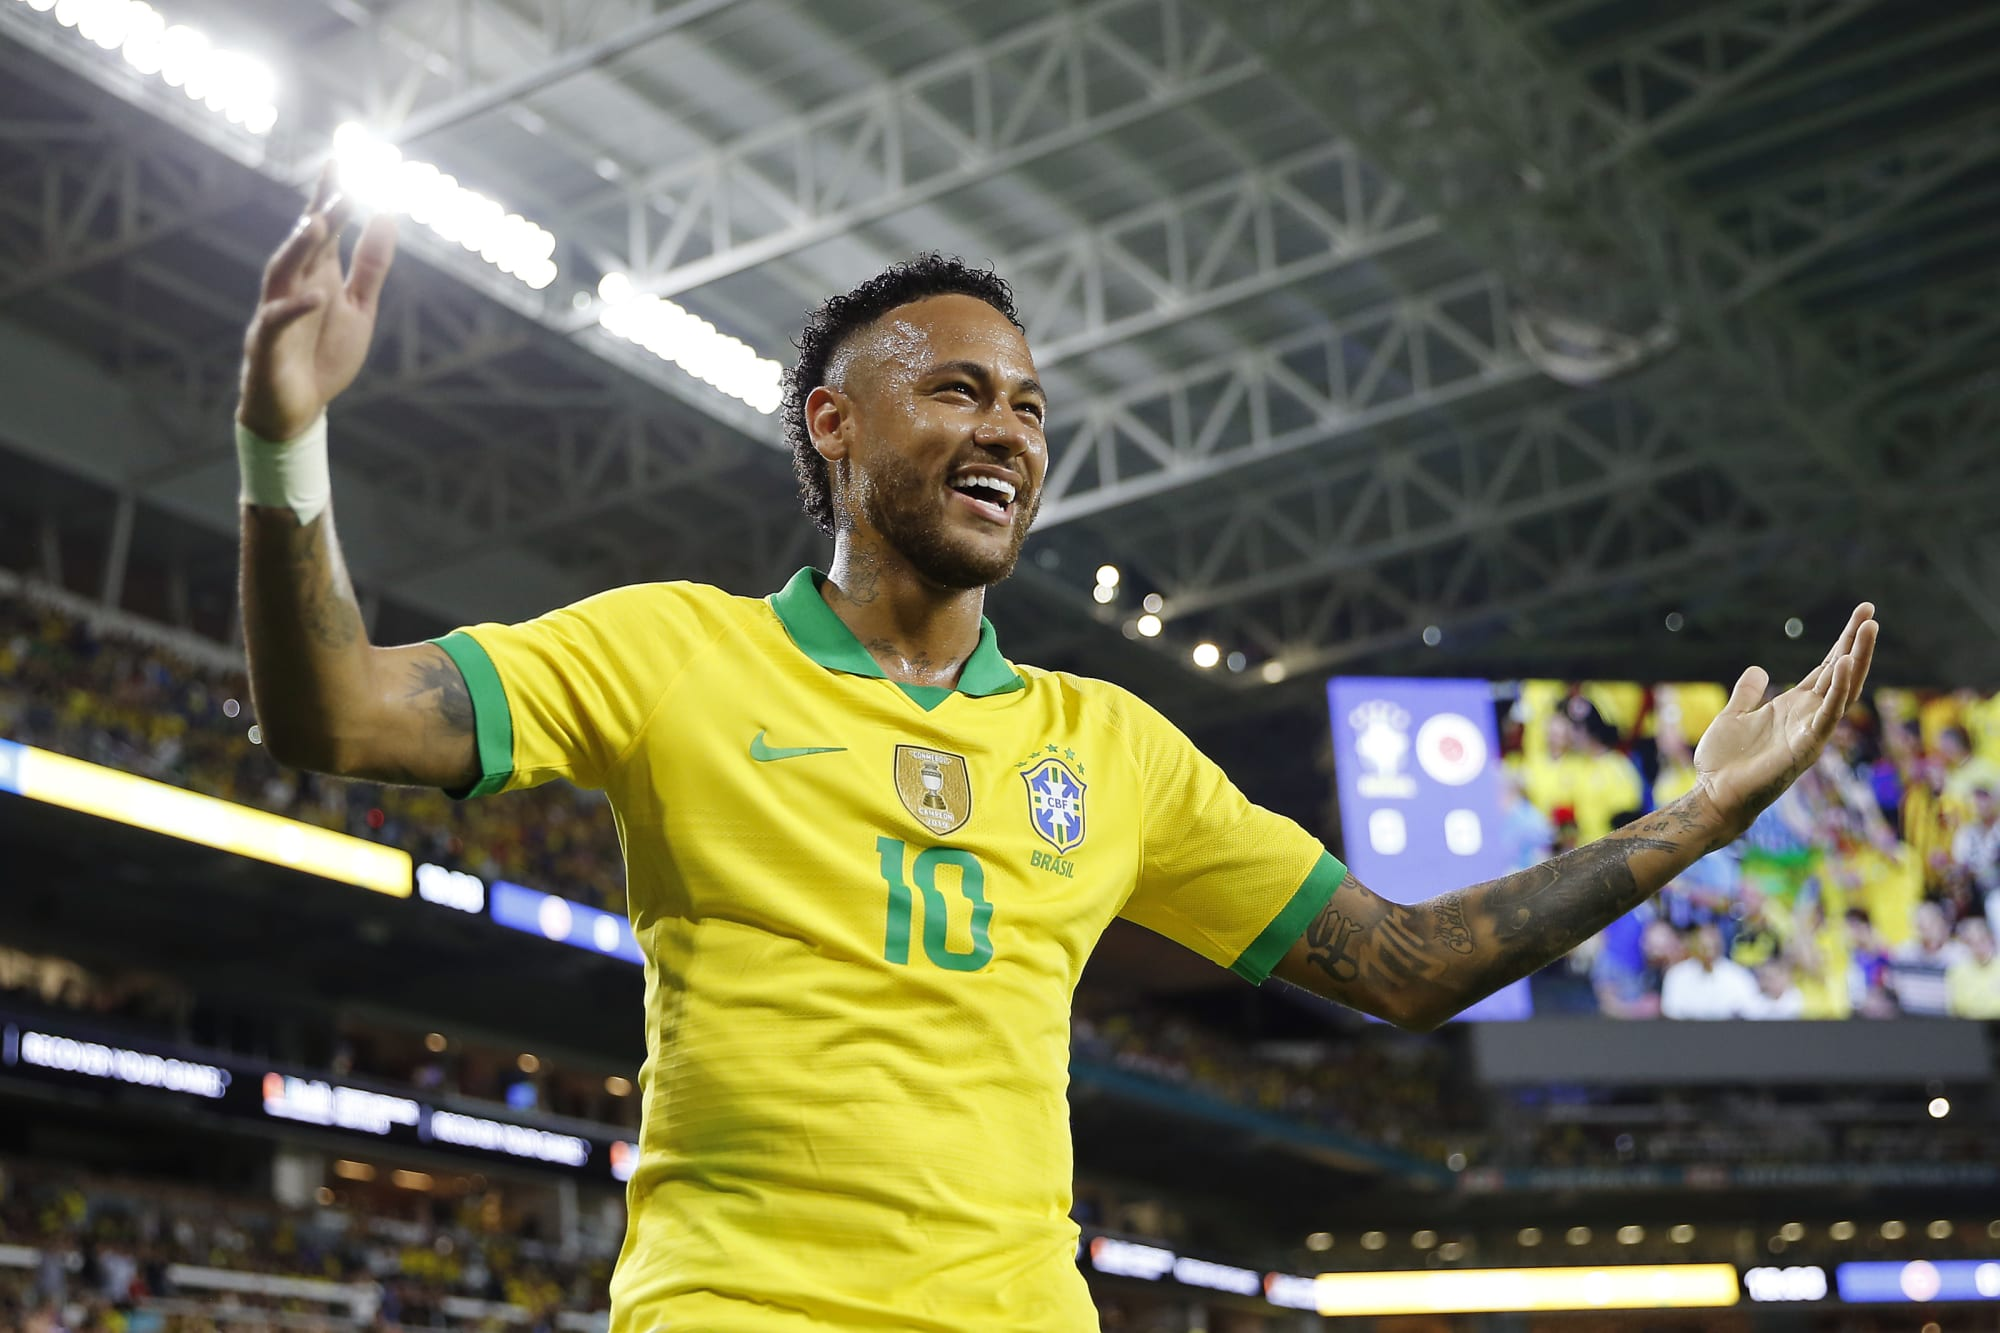 Paris Saint-Germain make non-negotiable demand for Neymar from Barcelona